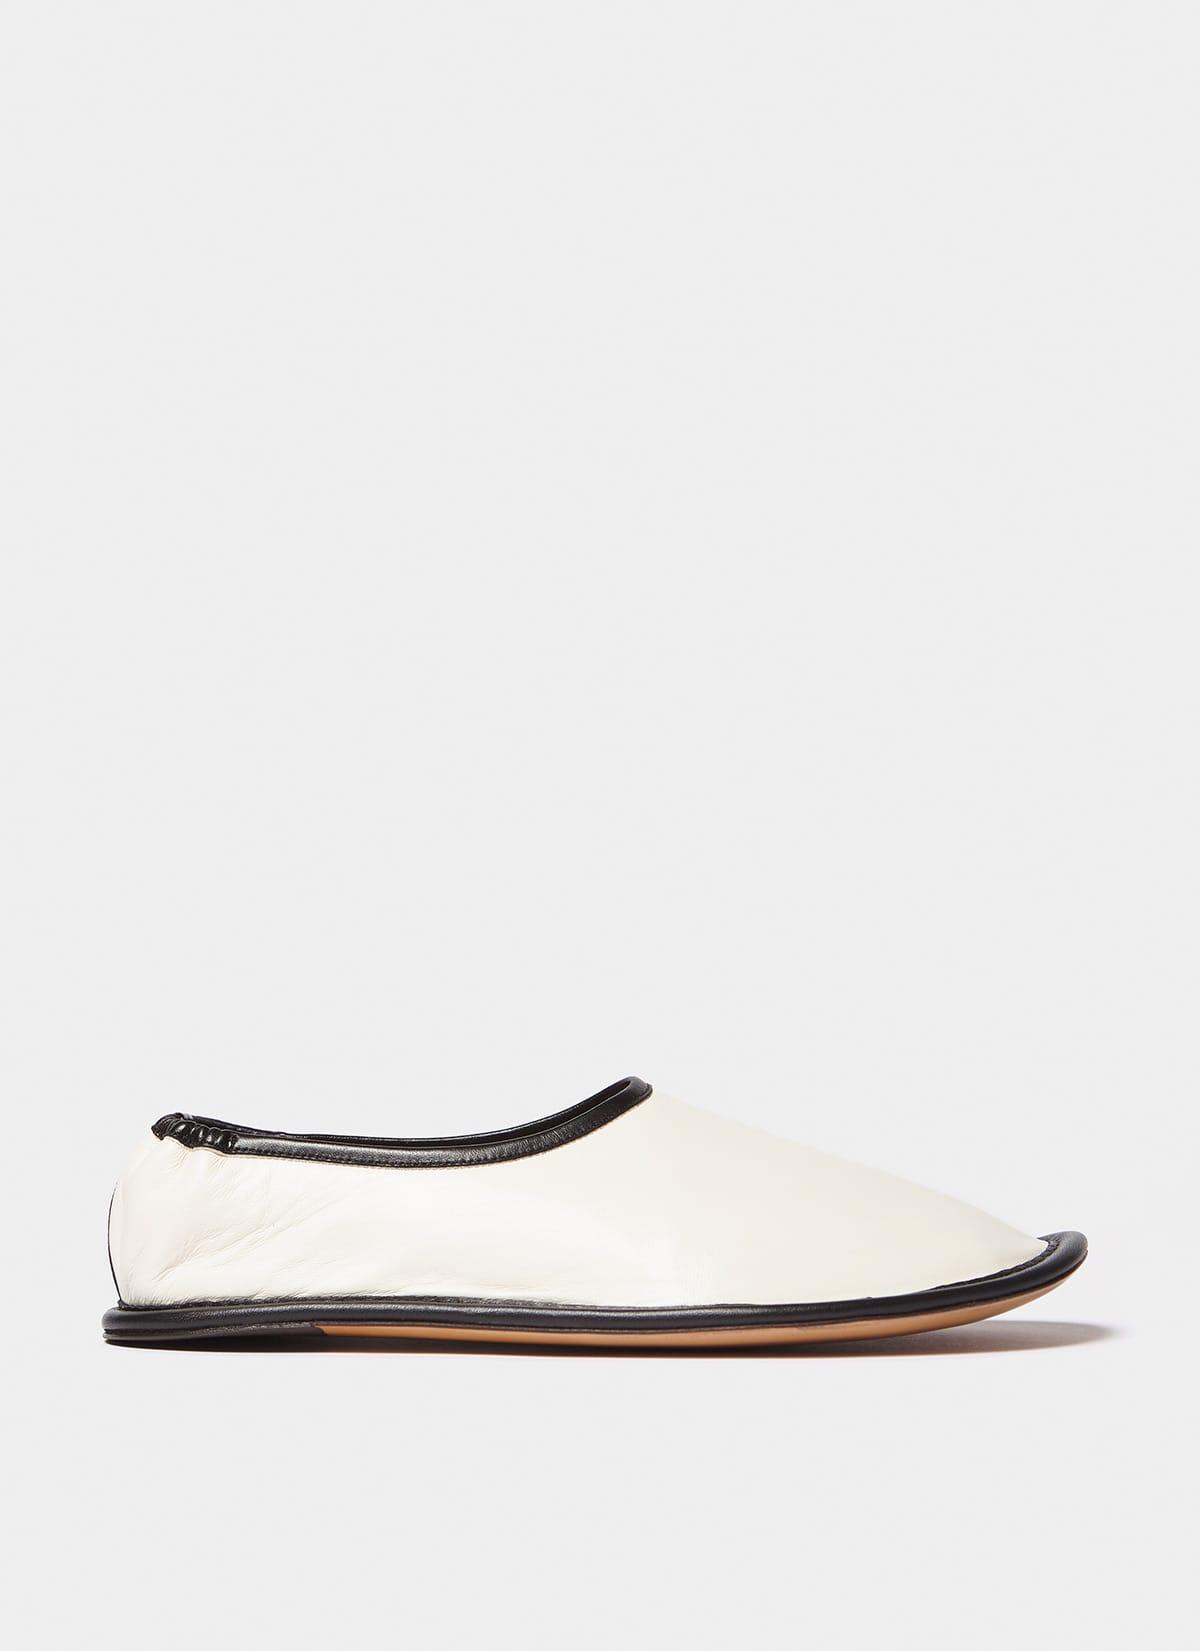 Marni Dancer Shoes_Front-Main